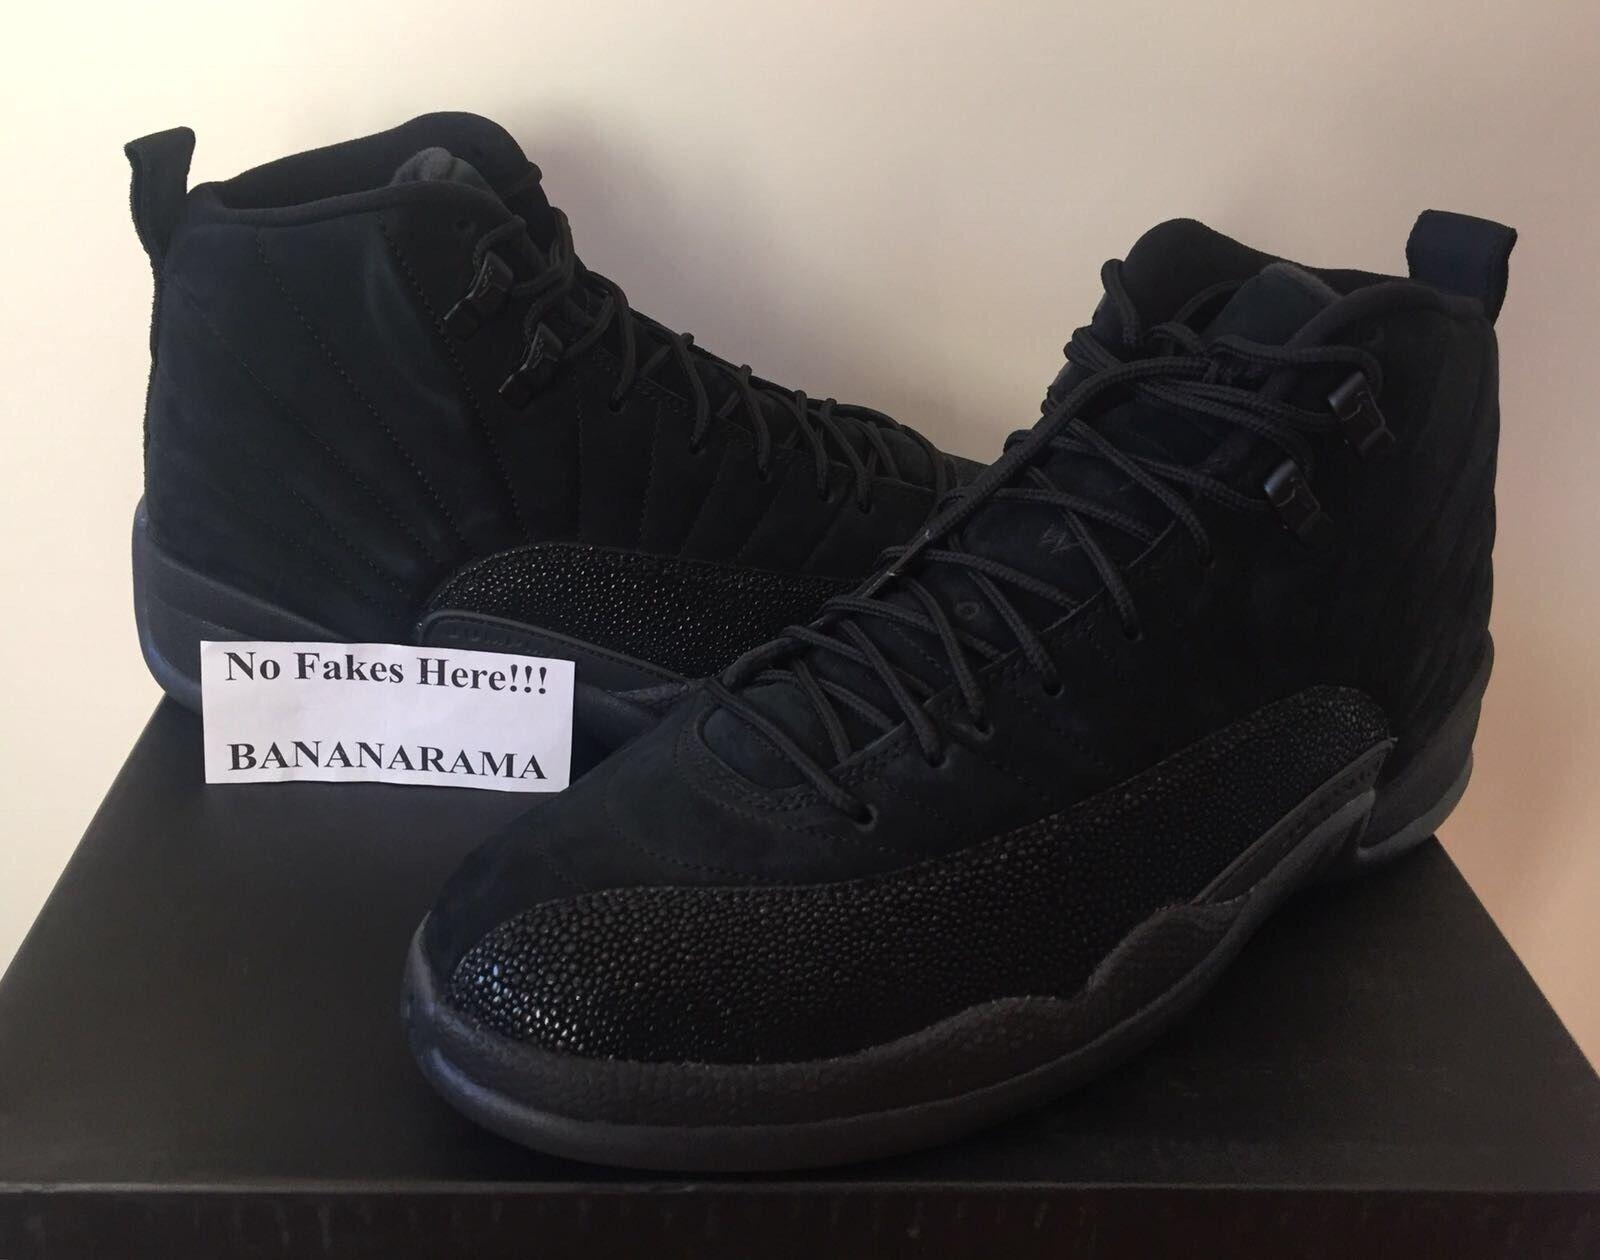 Nike Air Jordan XII 12 Retro OVO noir Drake QS US10 UK9 EU44 DS